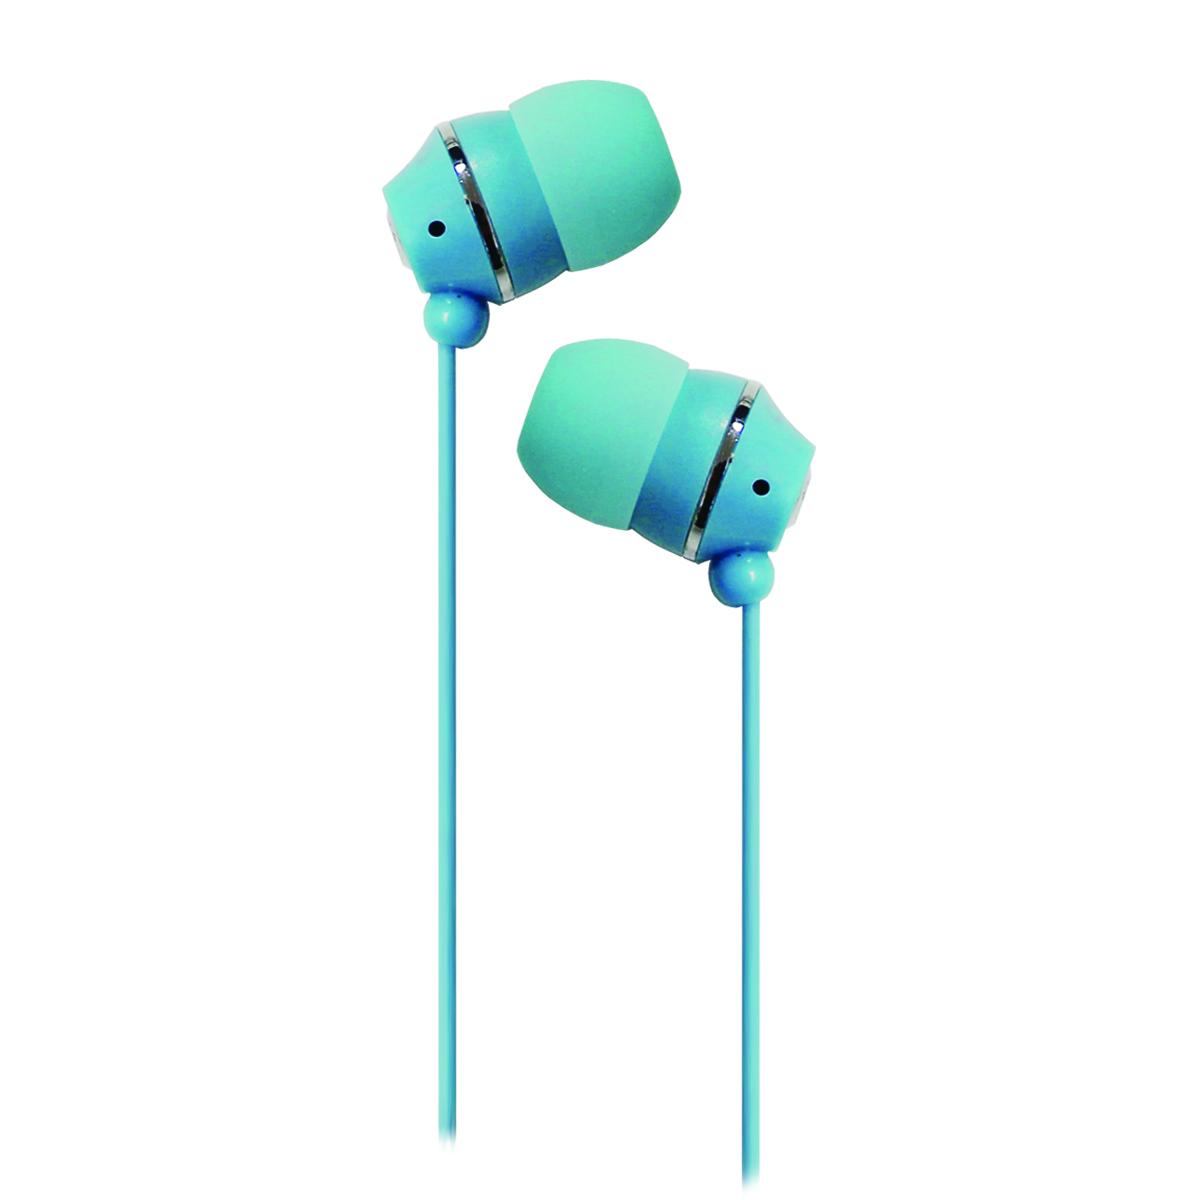 Jivo JI-1060BL Jellies In-Ear Noise Isolating Earphone|Soft & Comfy|Blueberry|New Thumbnail 6